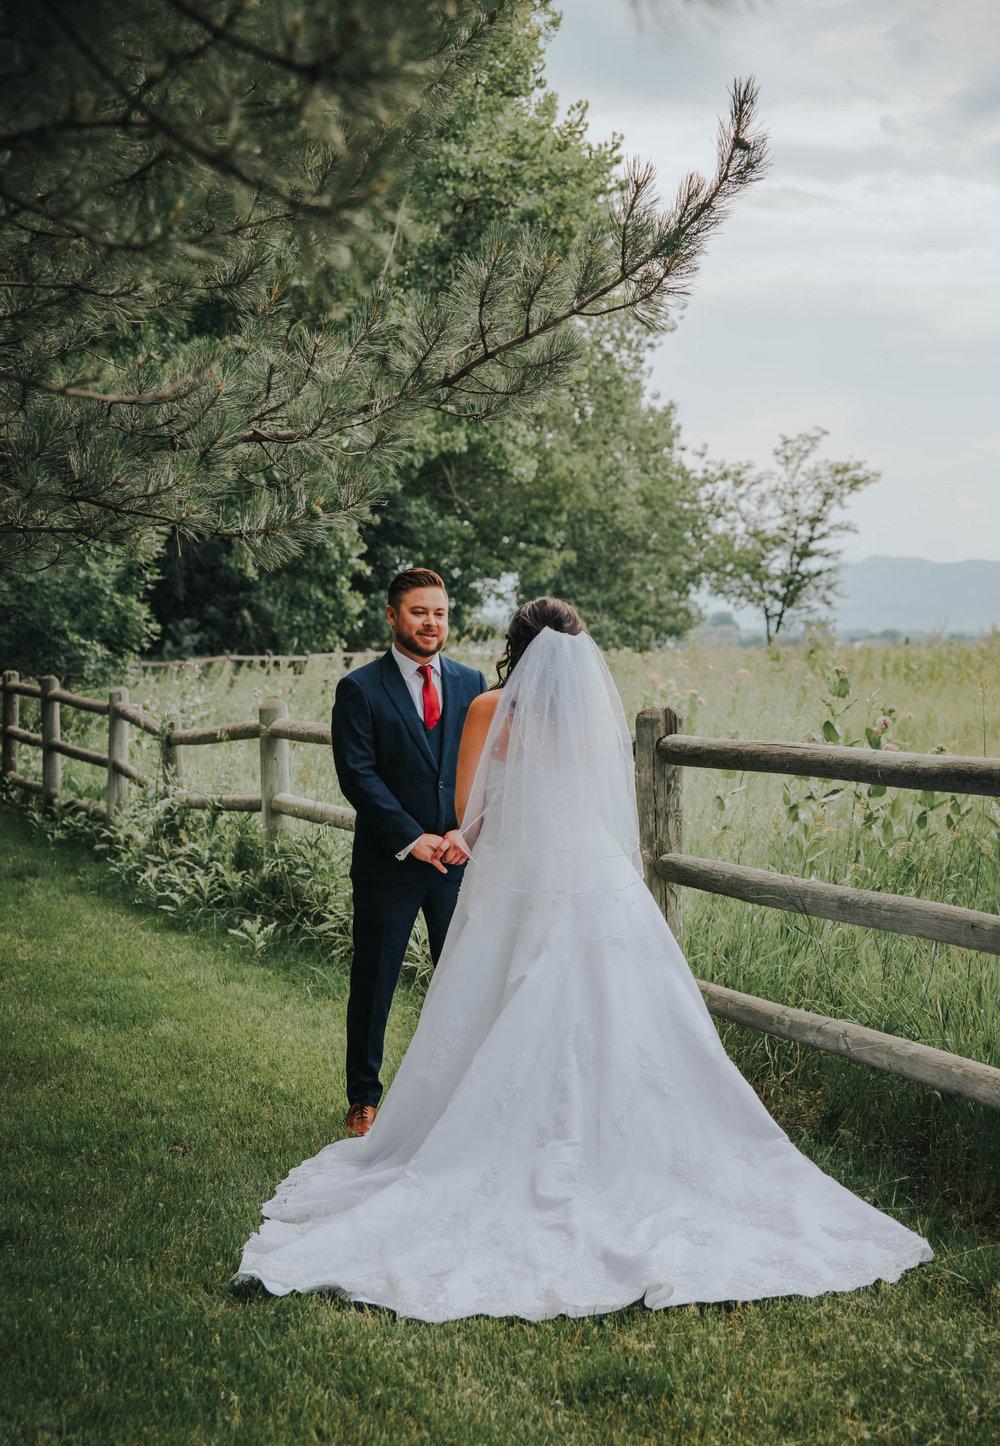 Colorado Wedding Photographer | Miss. Miller's Photography | First Look Wedding Photos